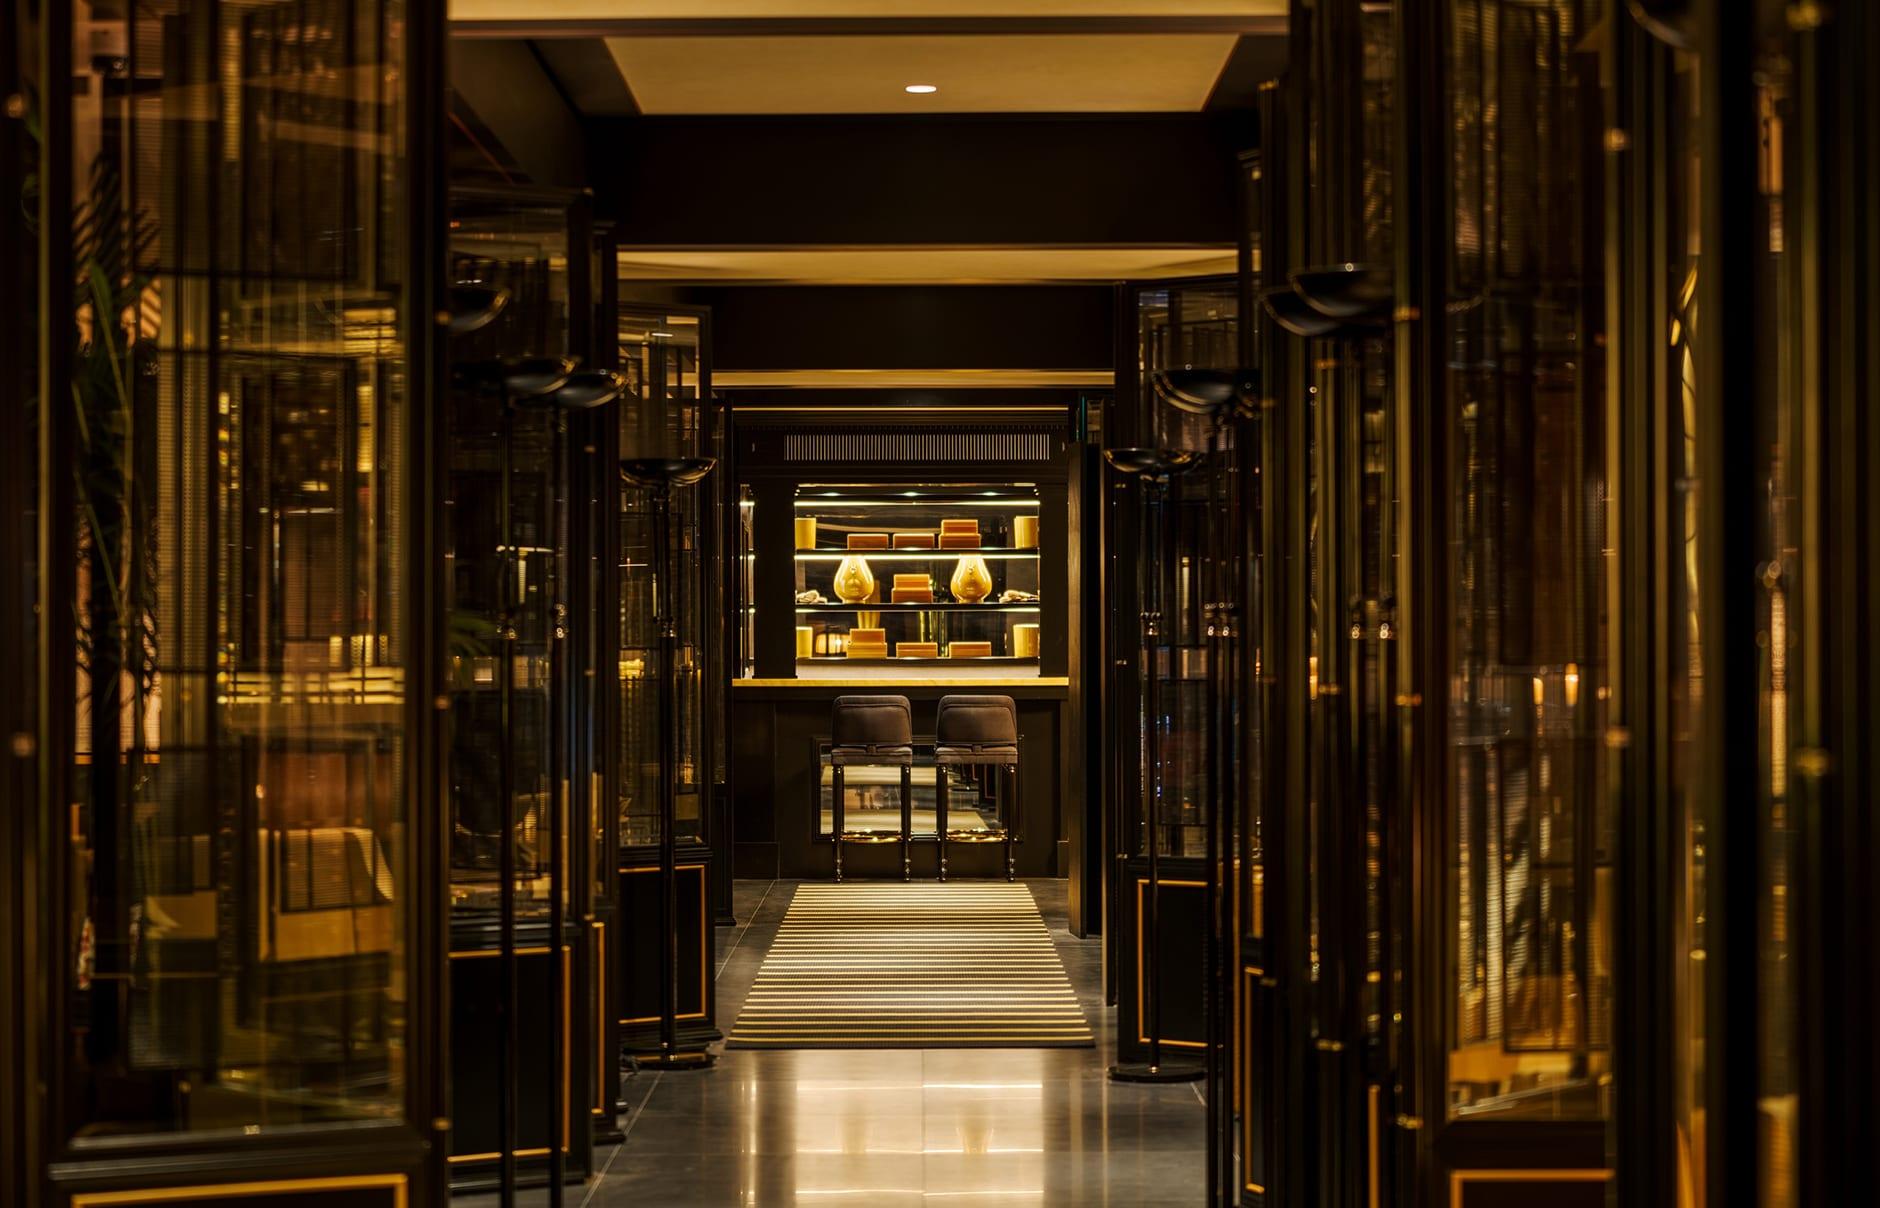 Six Senses Duxton, Singapore. Luxury Hotel Review by TravelPlusStyle. Photo © Six Senses Hotels Resorts Spas